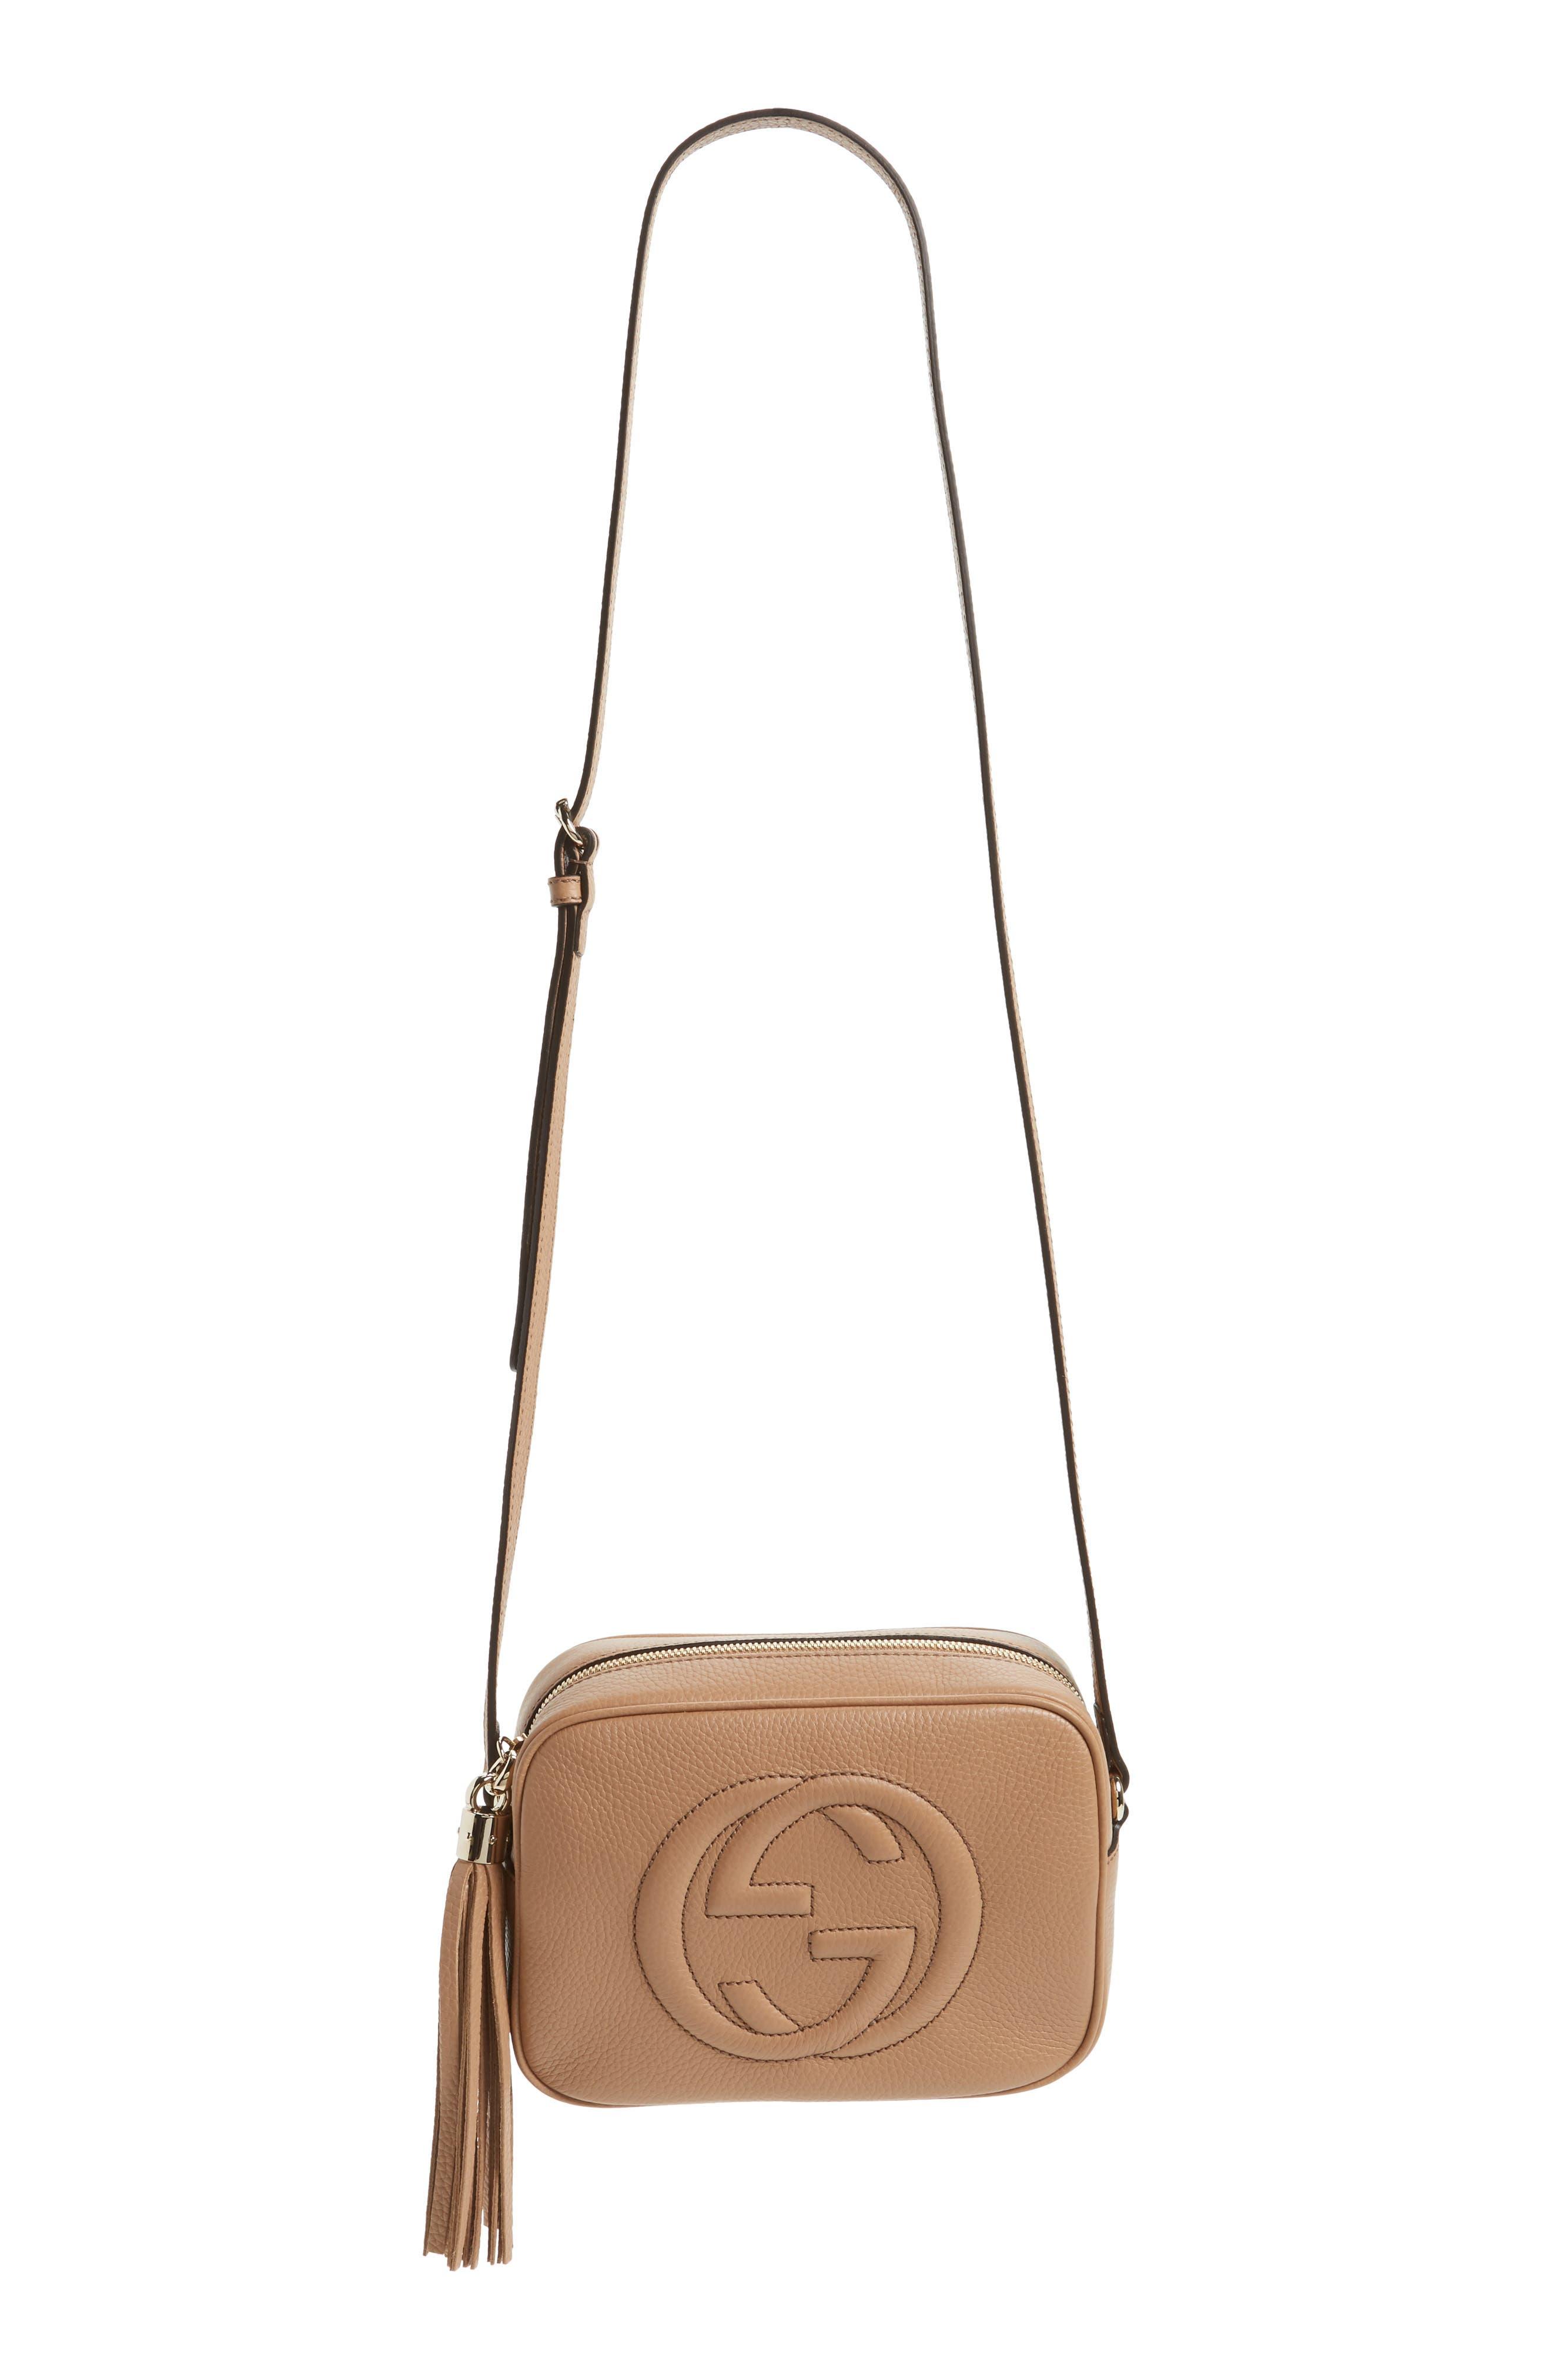 GUCCI Soho Disco Leather Bag, Main, color, 2754 CAMELIA